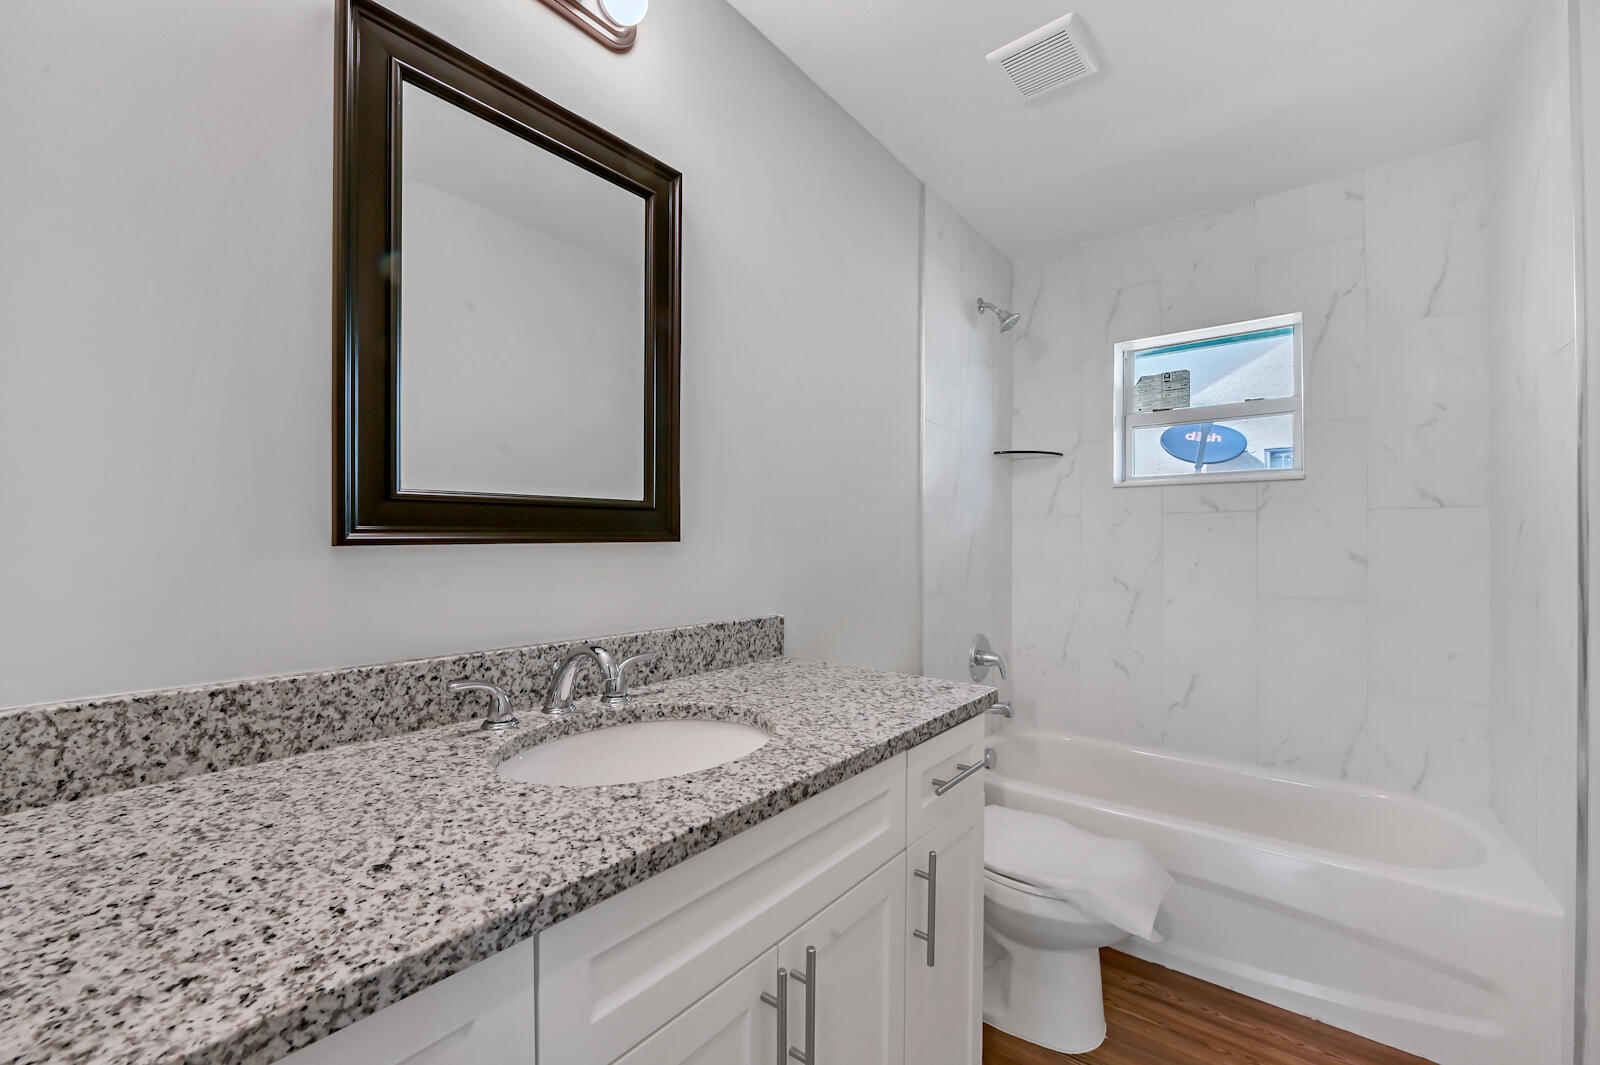 15 Bath room 01